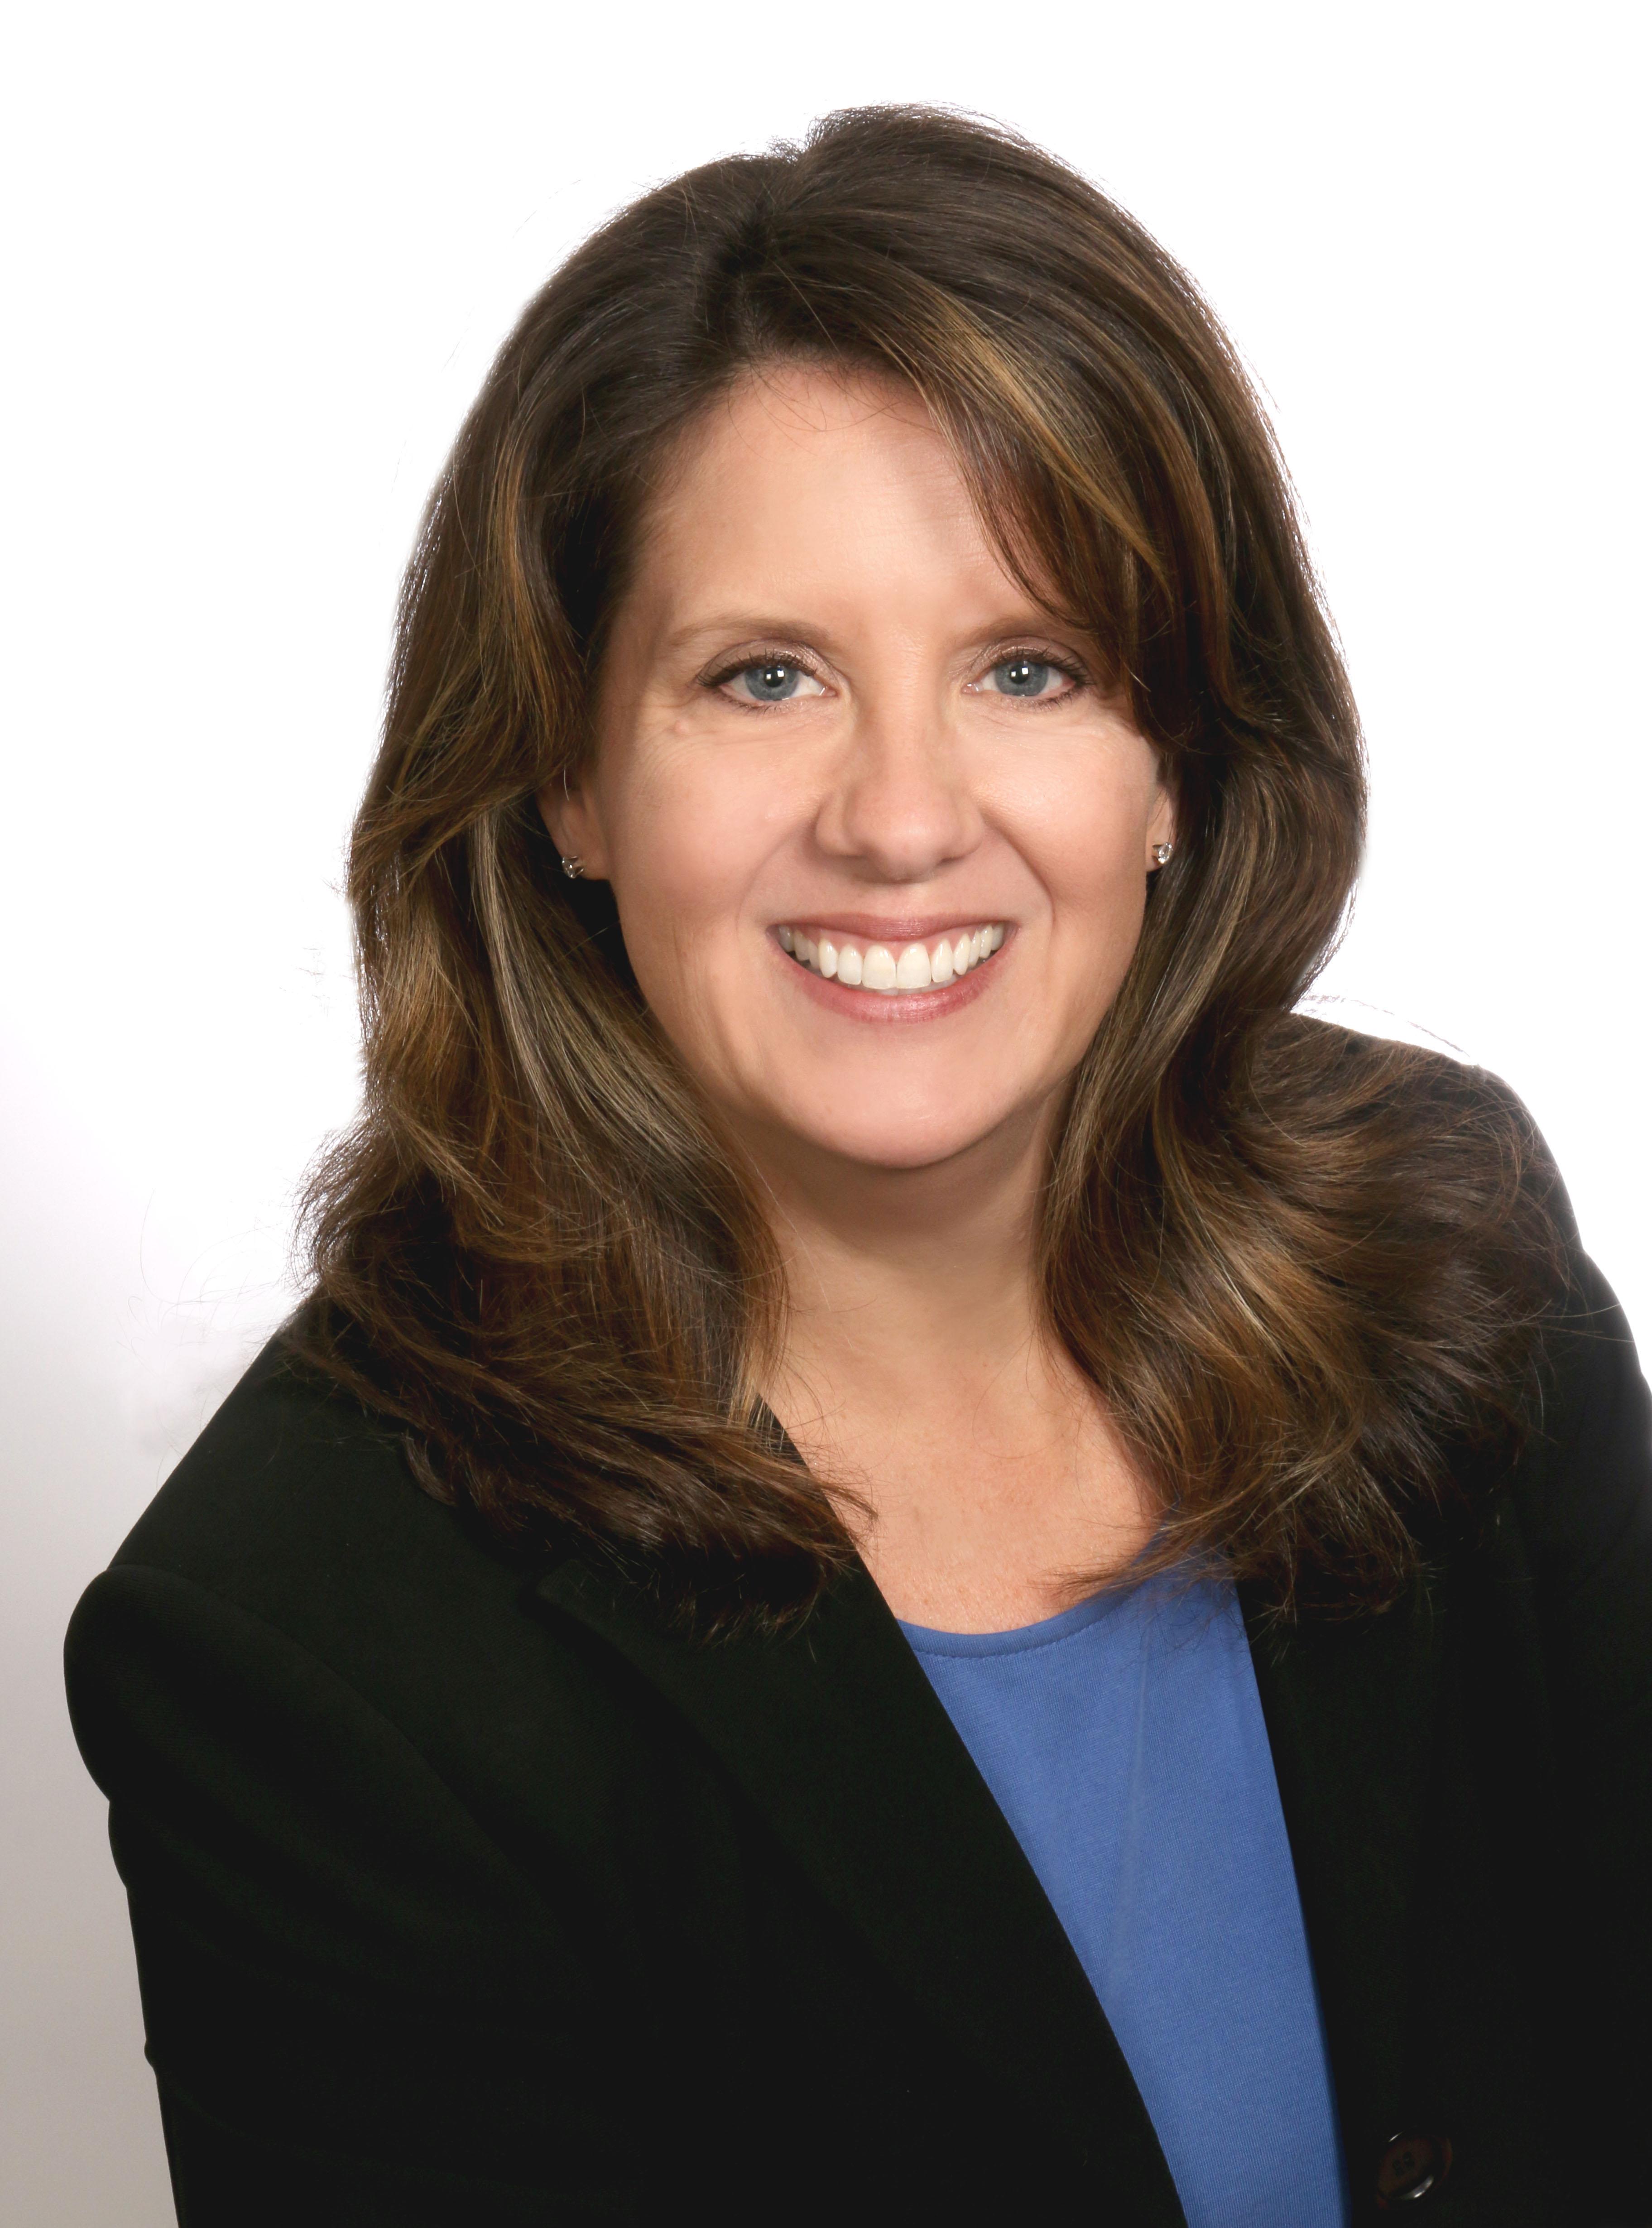 Amy Enoch